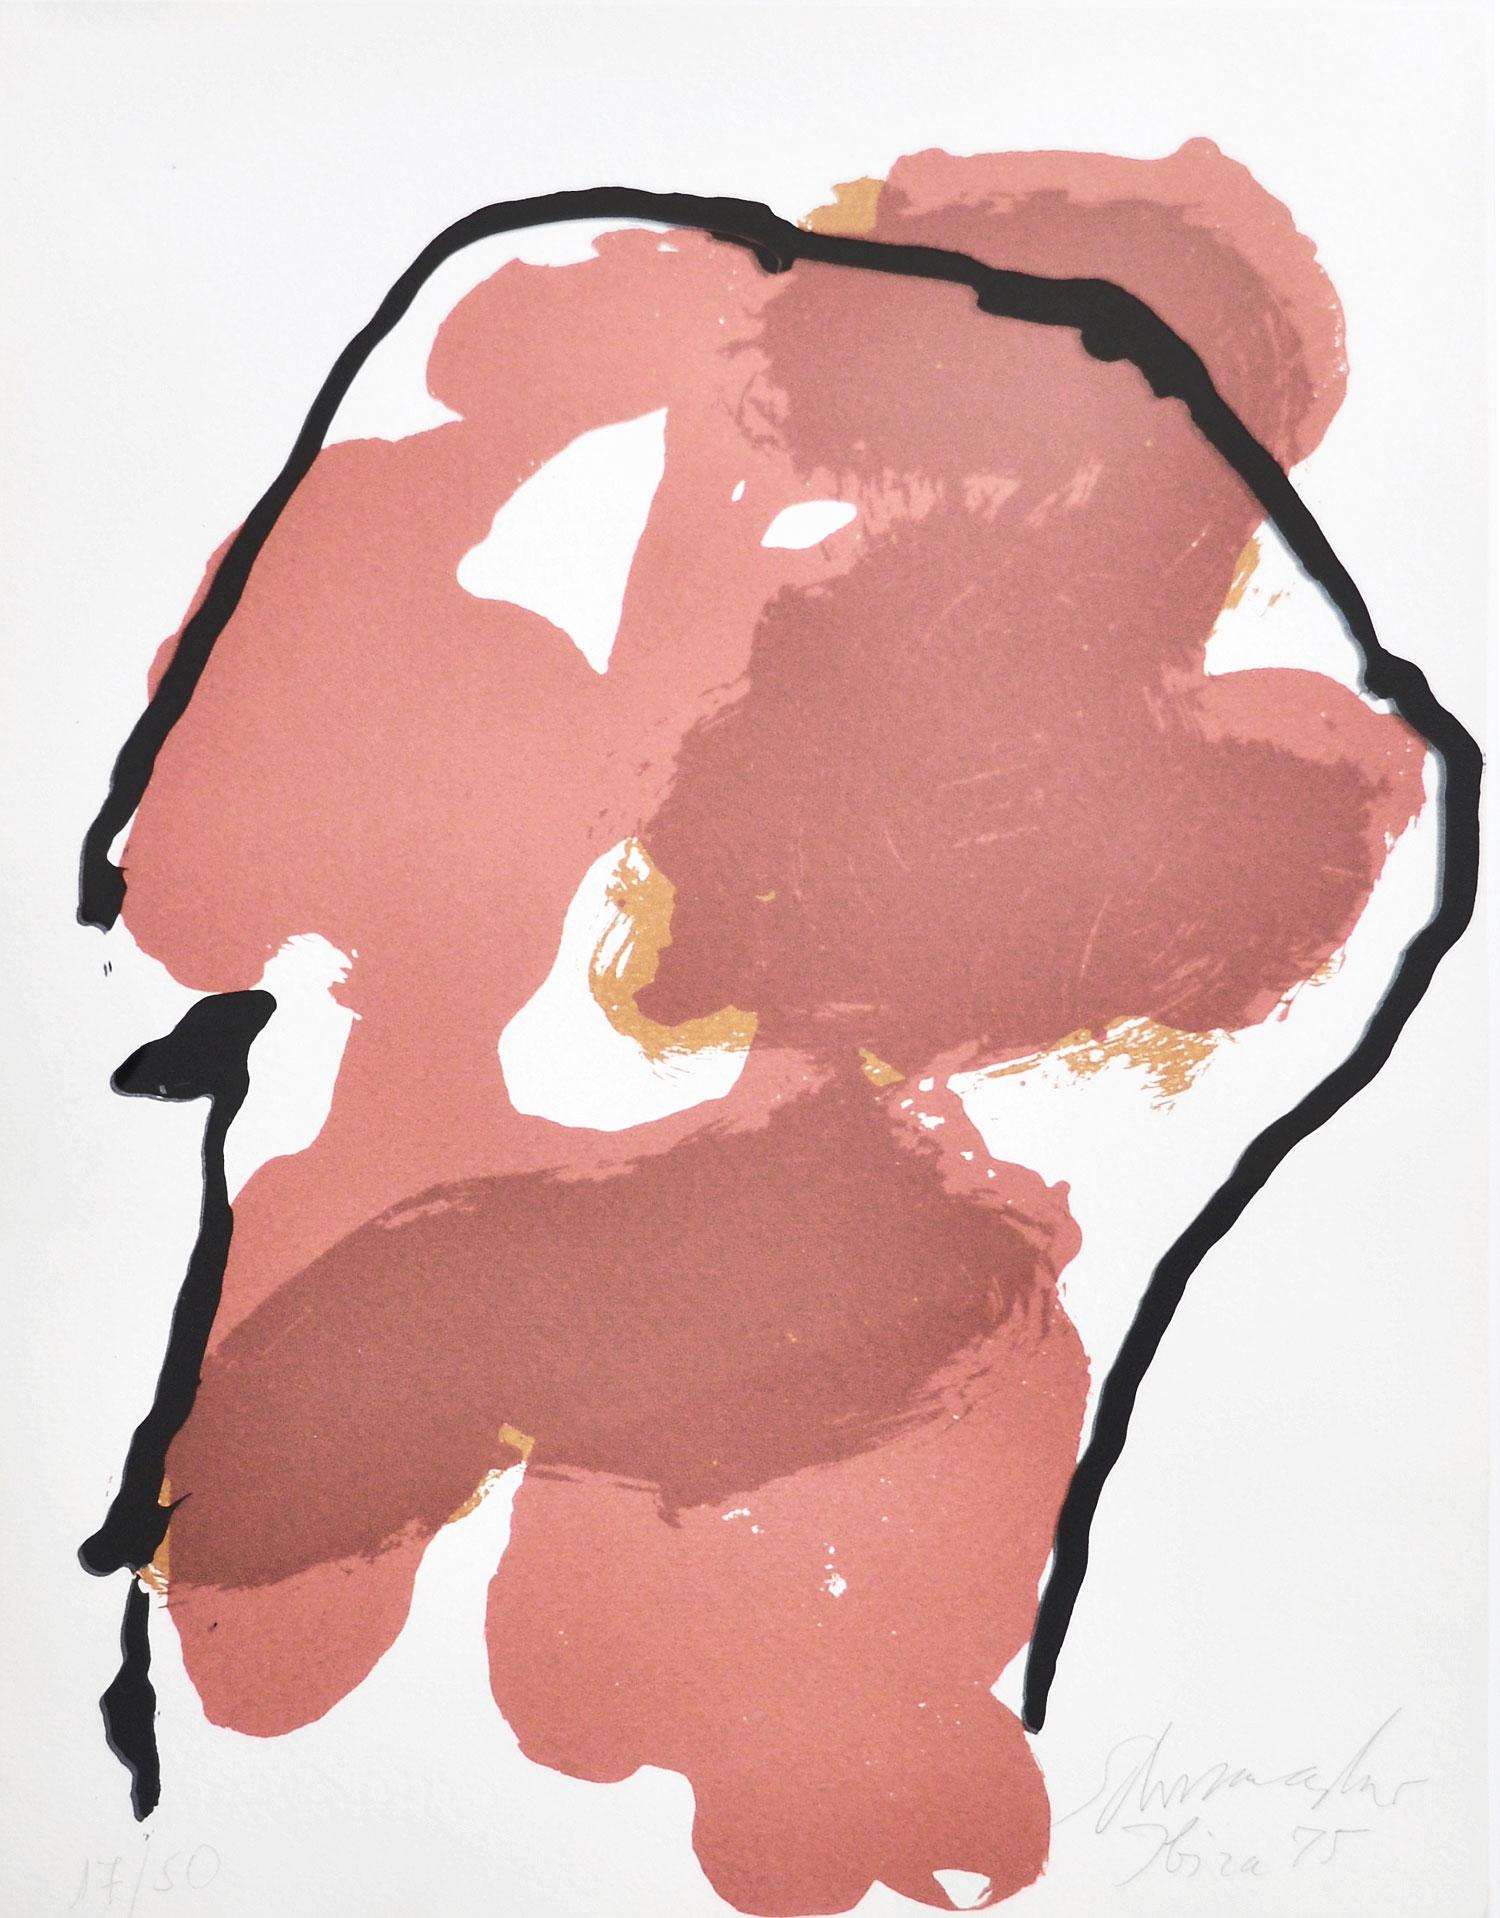 Emil Schumacher Grafik, Composition Ibiza, 1975